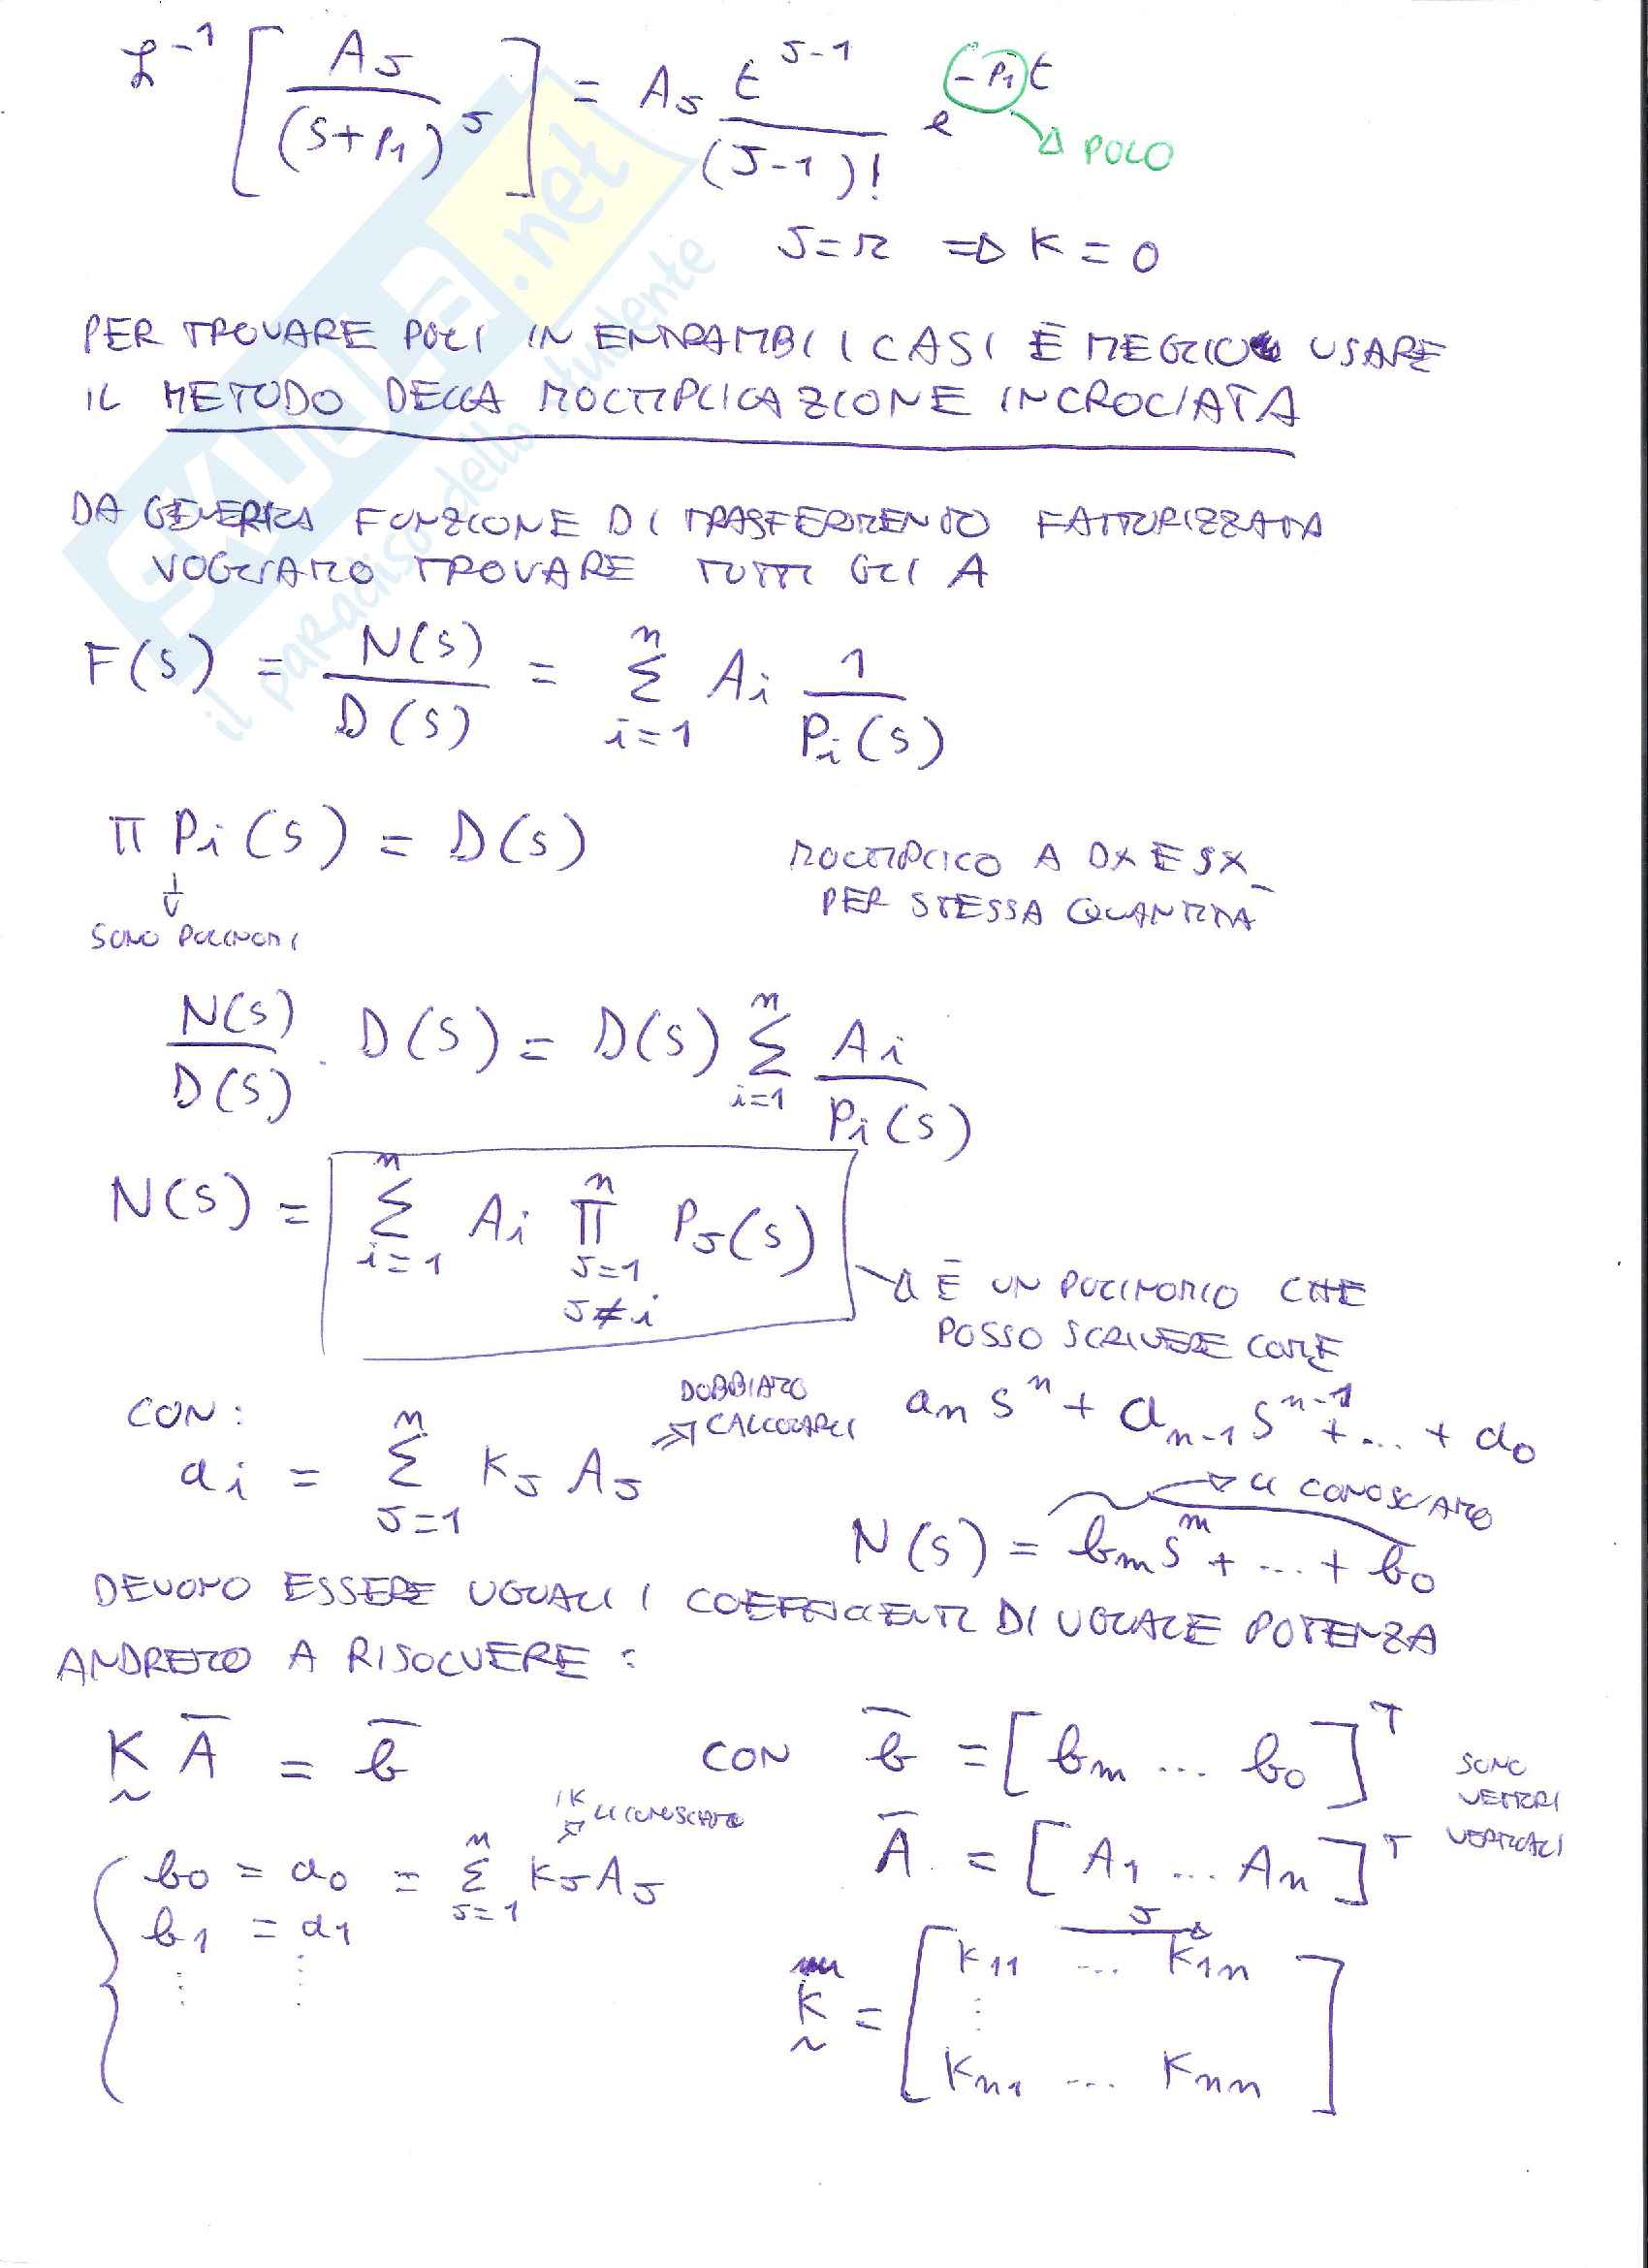 Gestione dei Sistemi Energetici M - Appunti Pag. 26